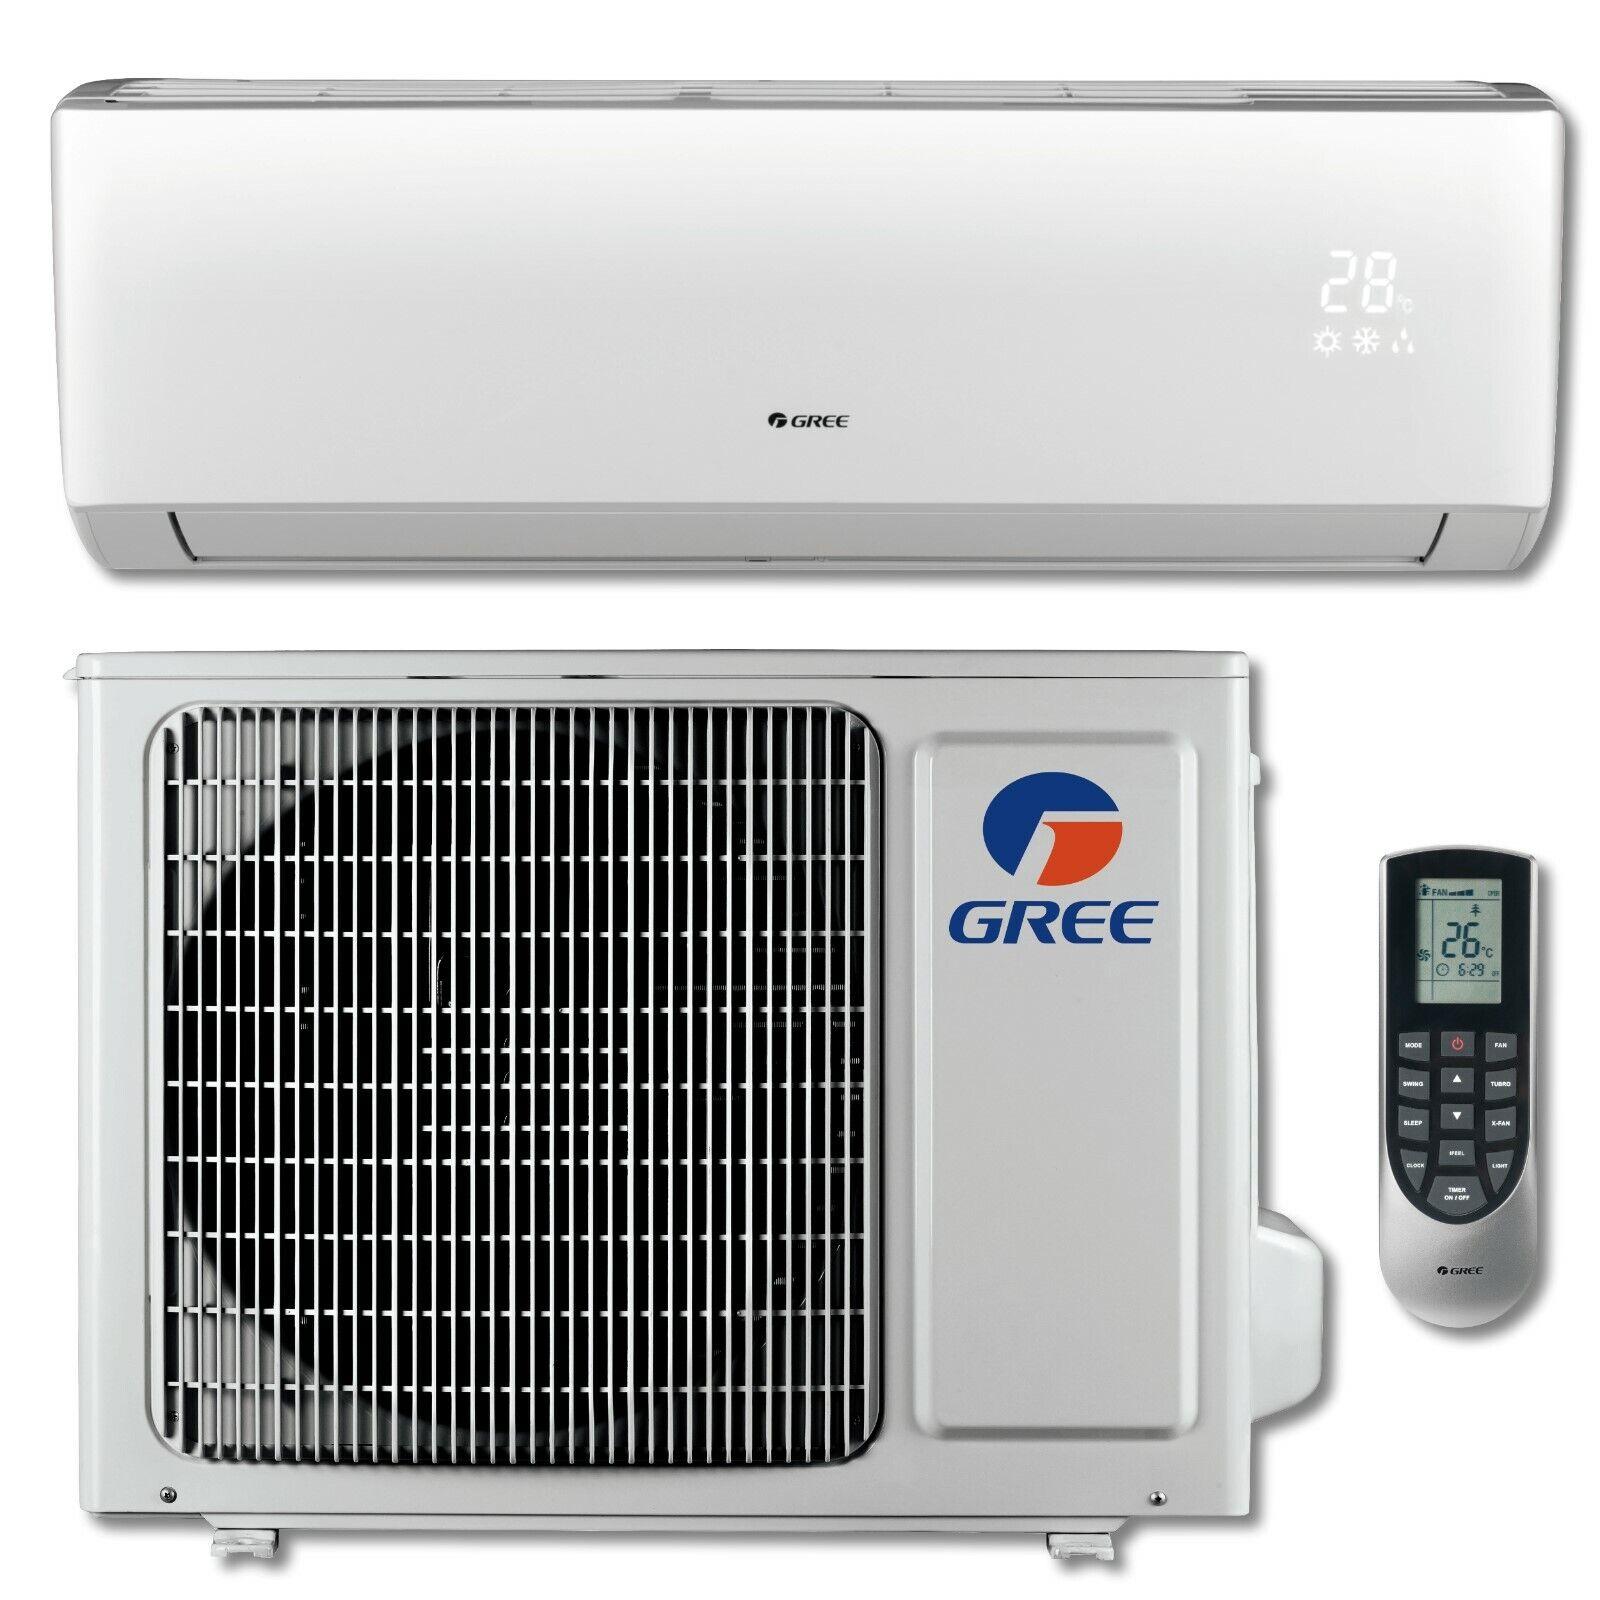 NEW GREE LIVO+ 12,000 BTU Ductless Mini Split Air Conditione